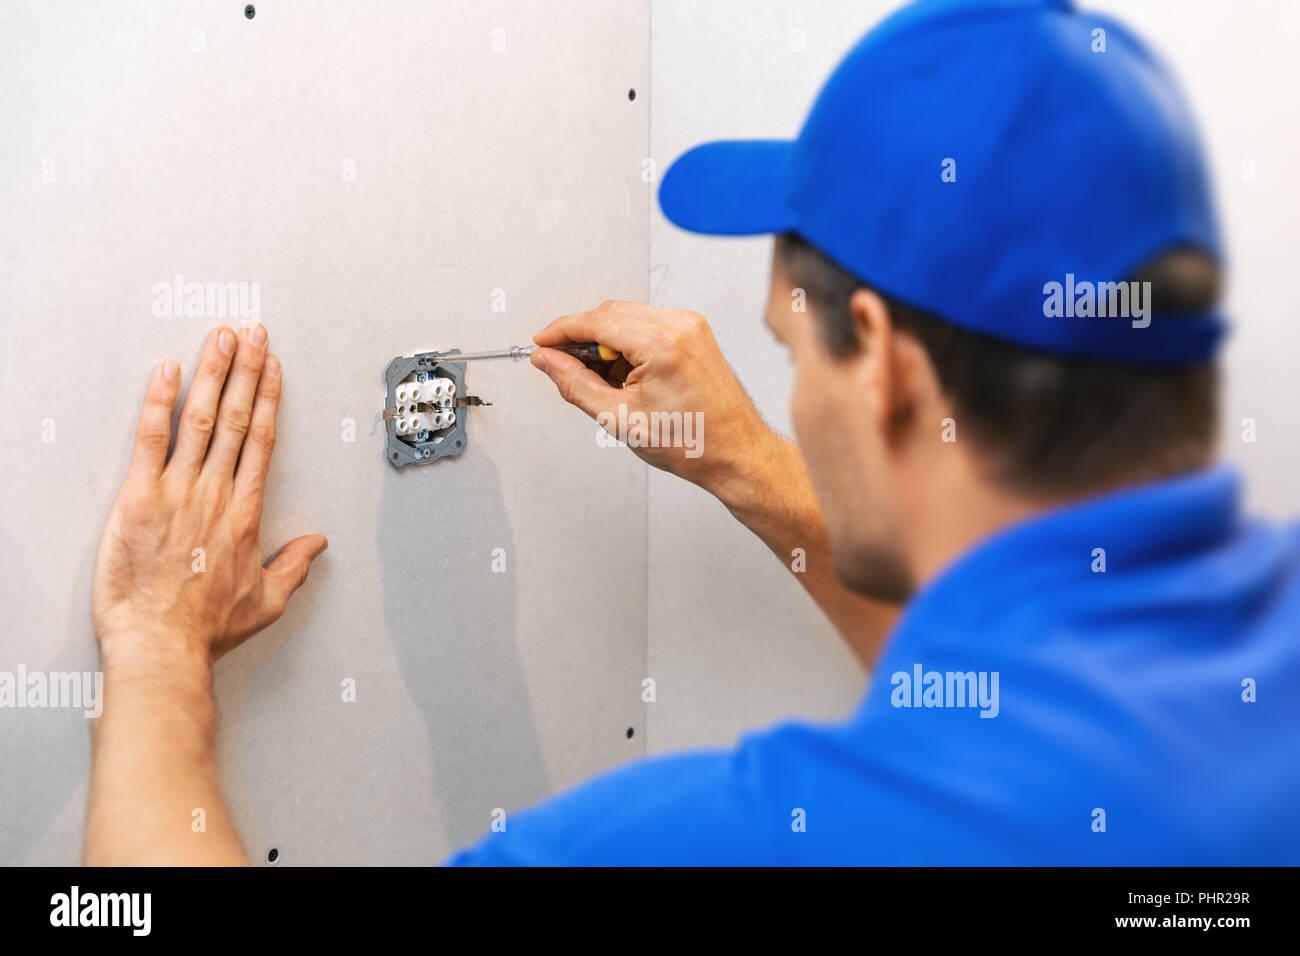 Elektriker installieren Steckdose an der Wand Stockfoto